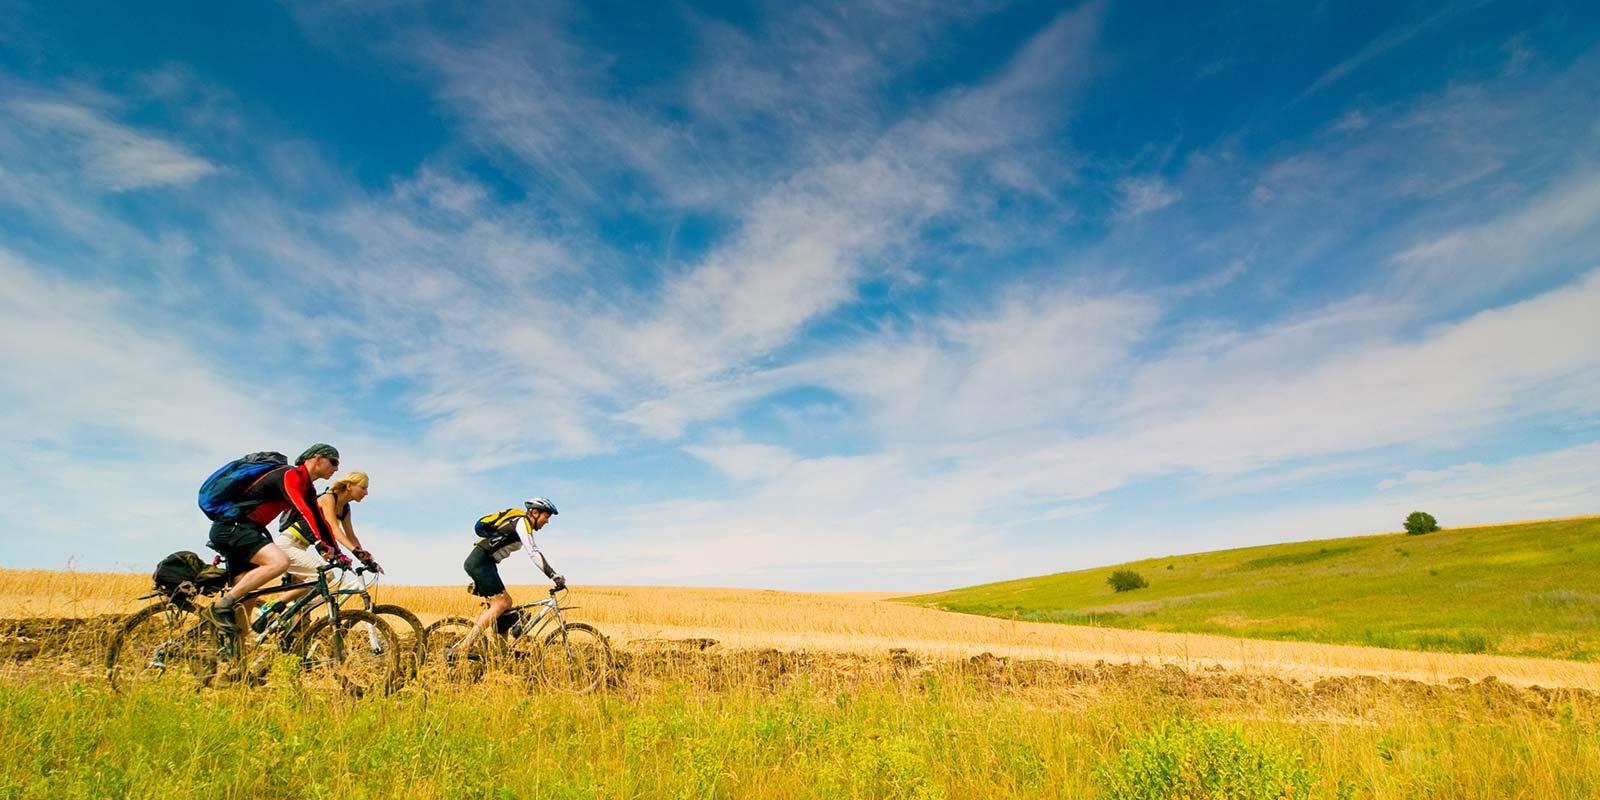 Radfahrer am Feldrand